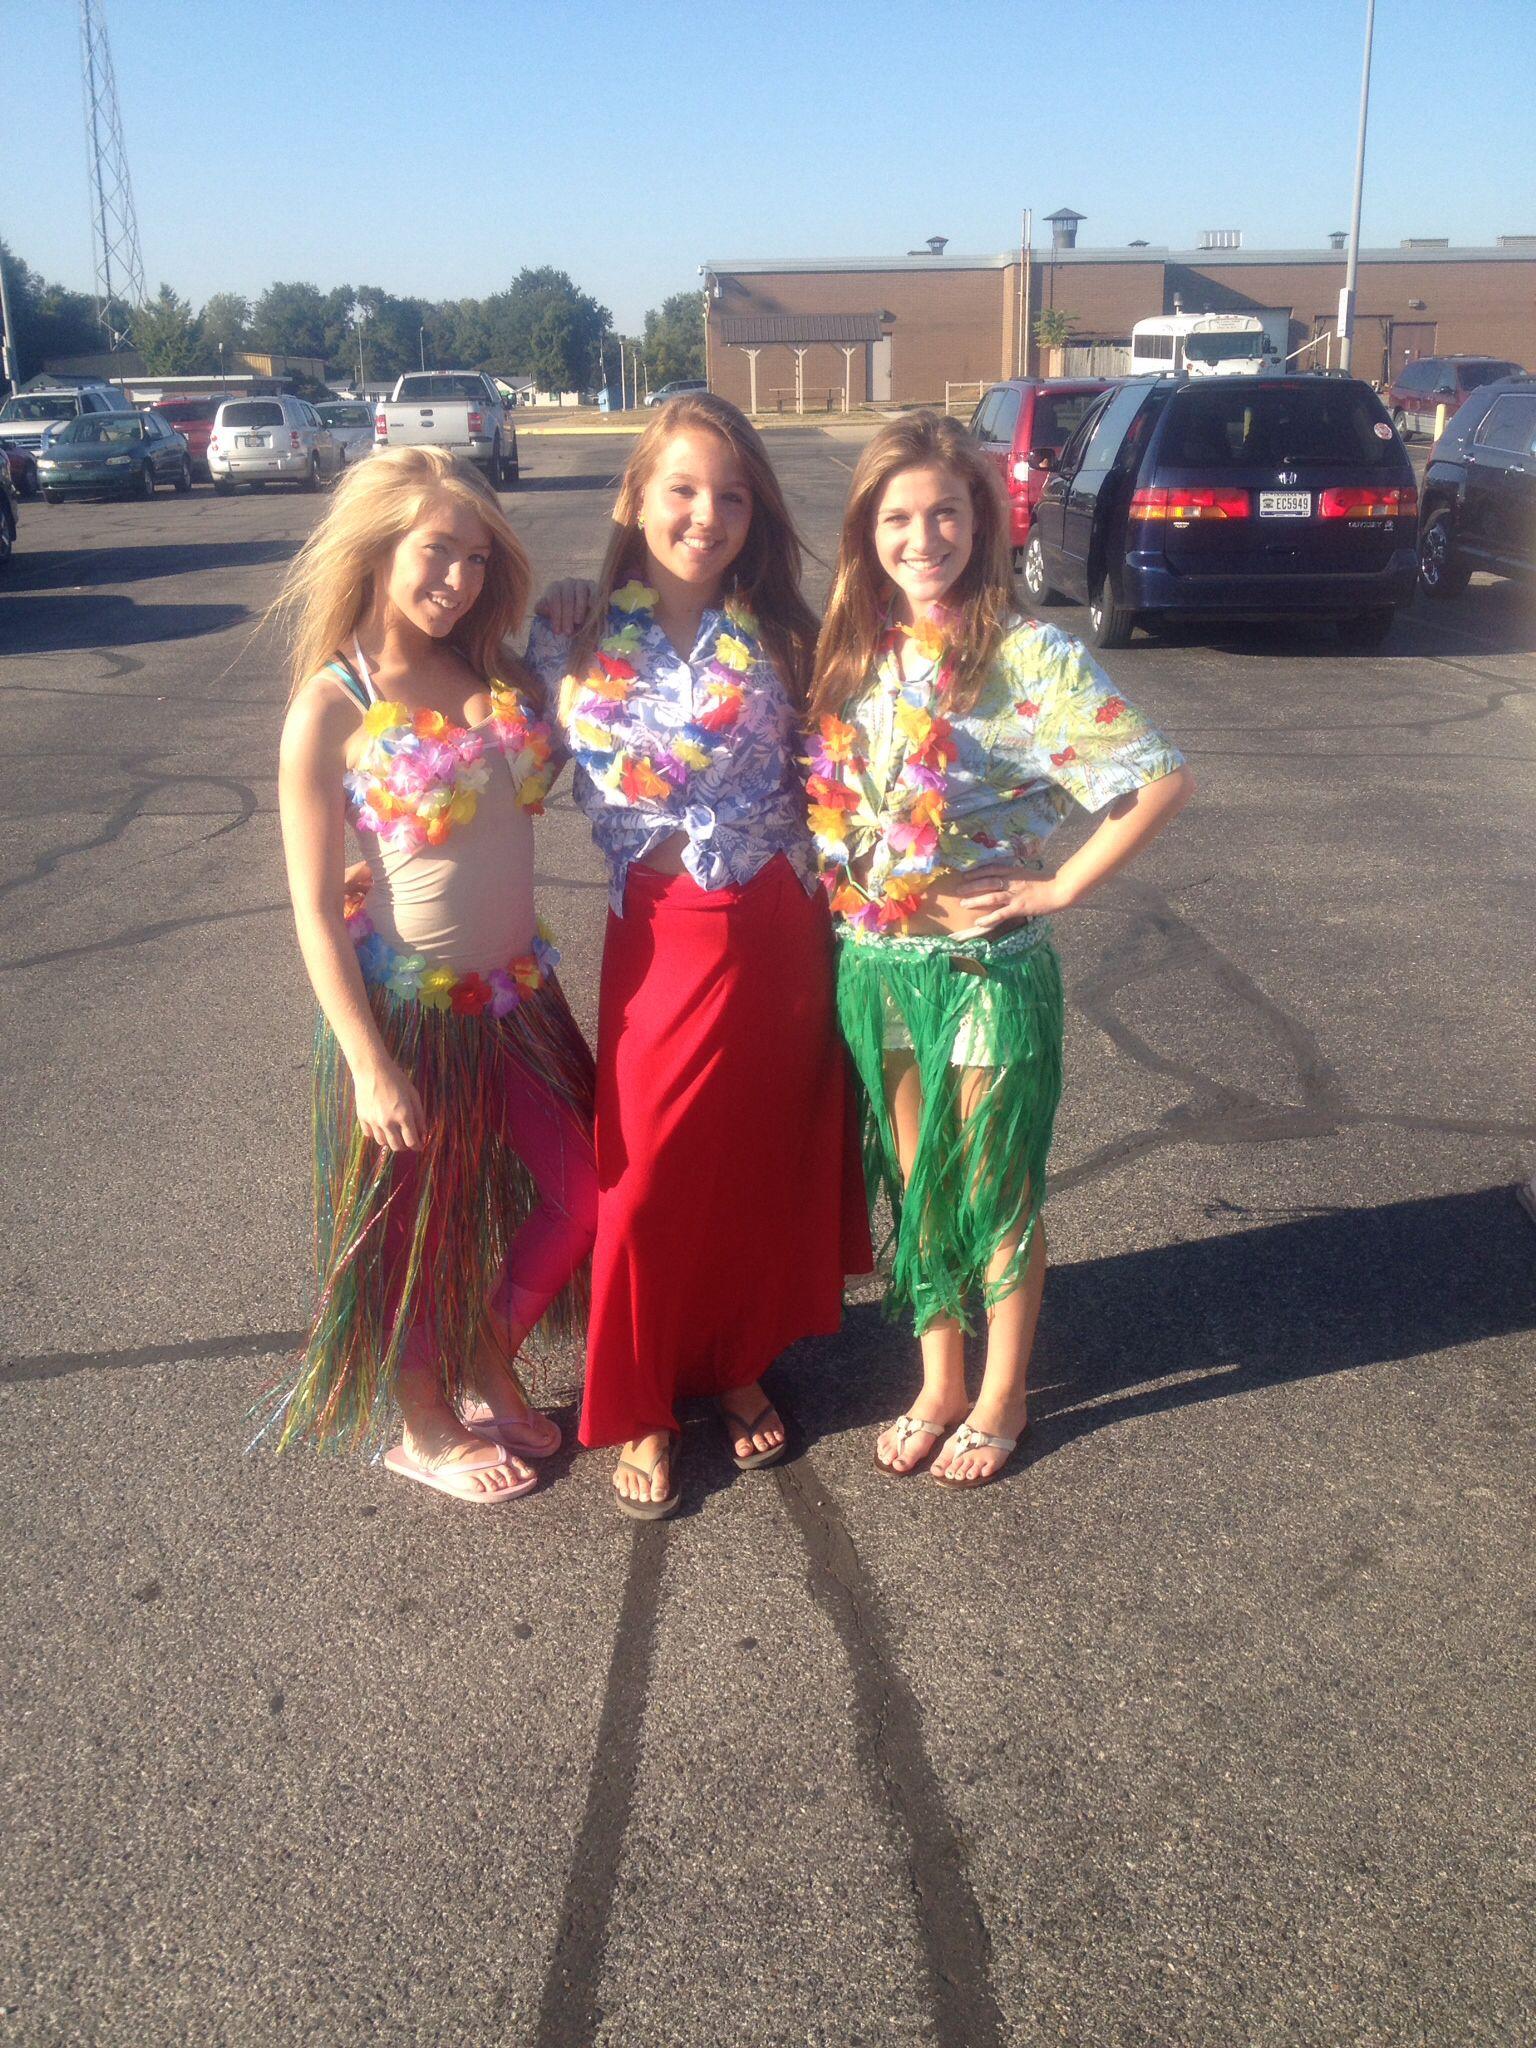 Hawaiian themed football game, perfect outfits! Luau